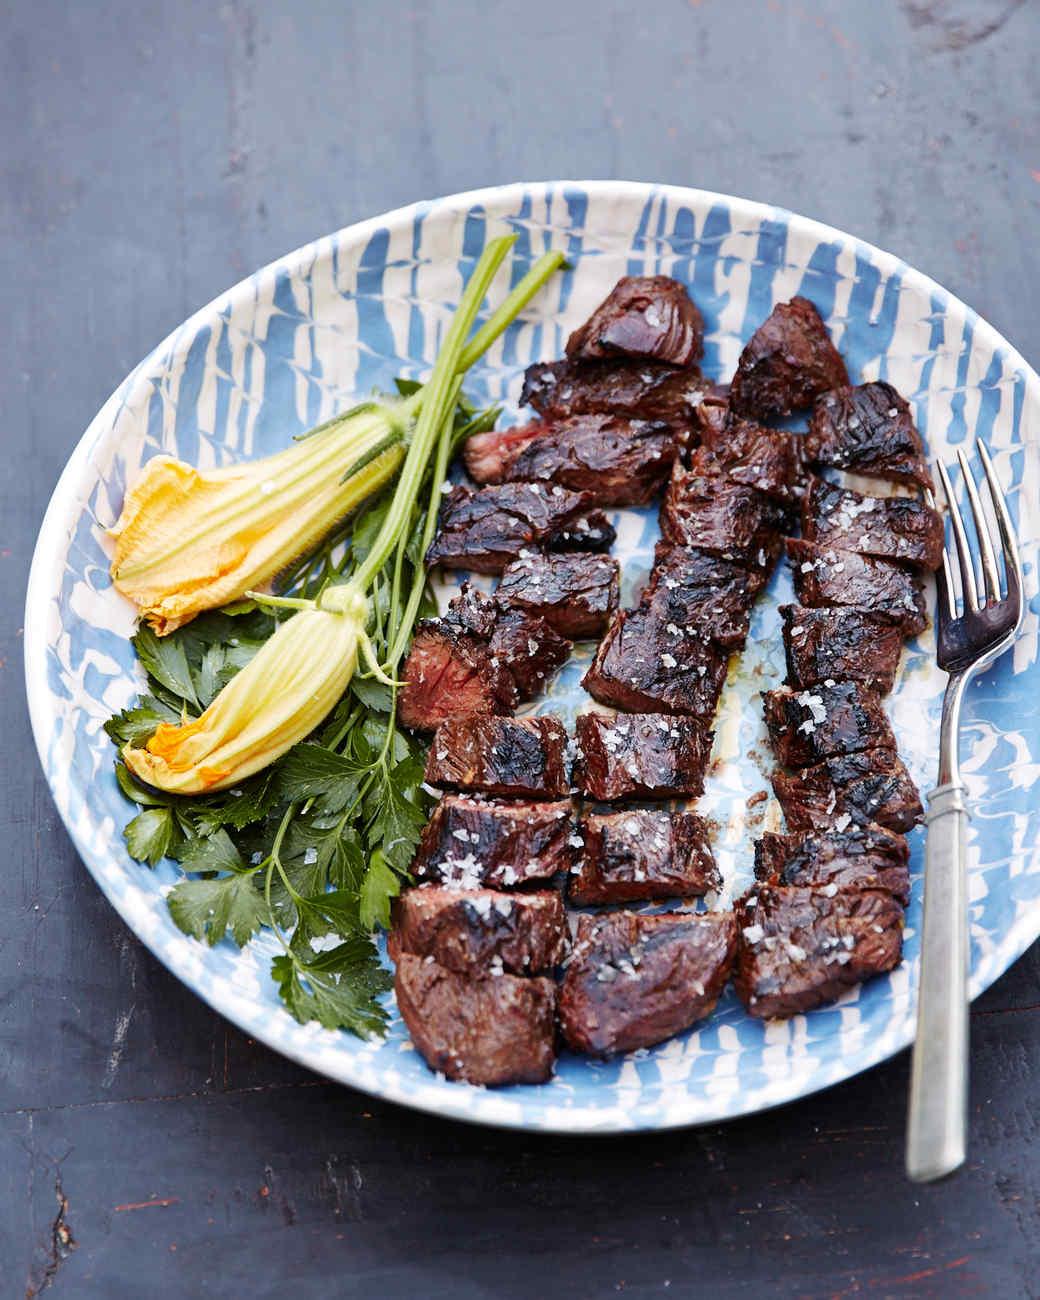 steak-frances-palmer-477-d110591.jpg